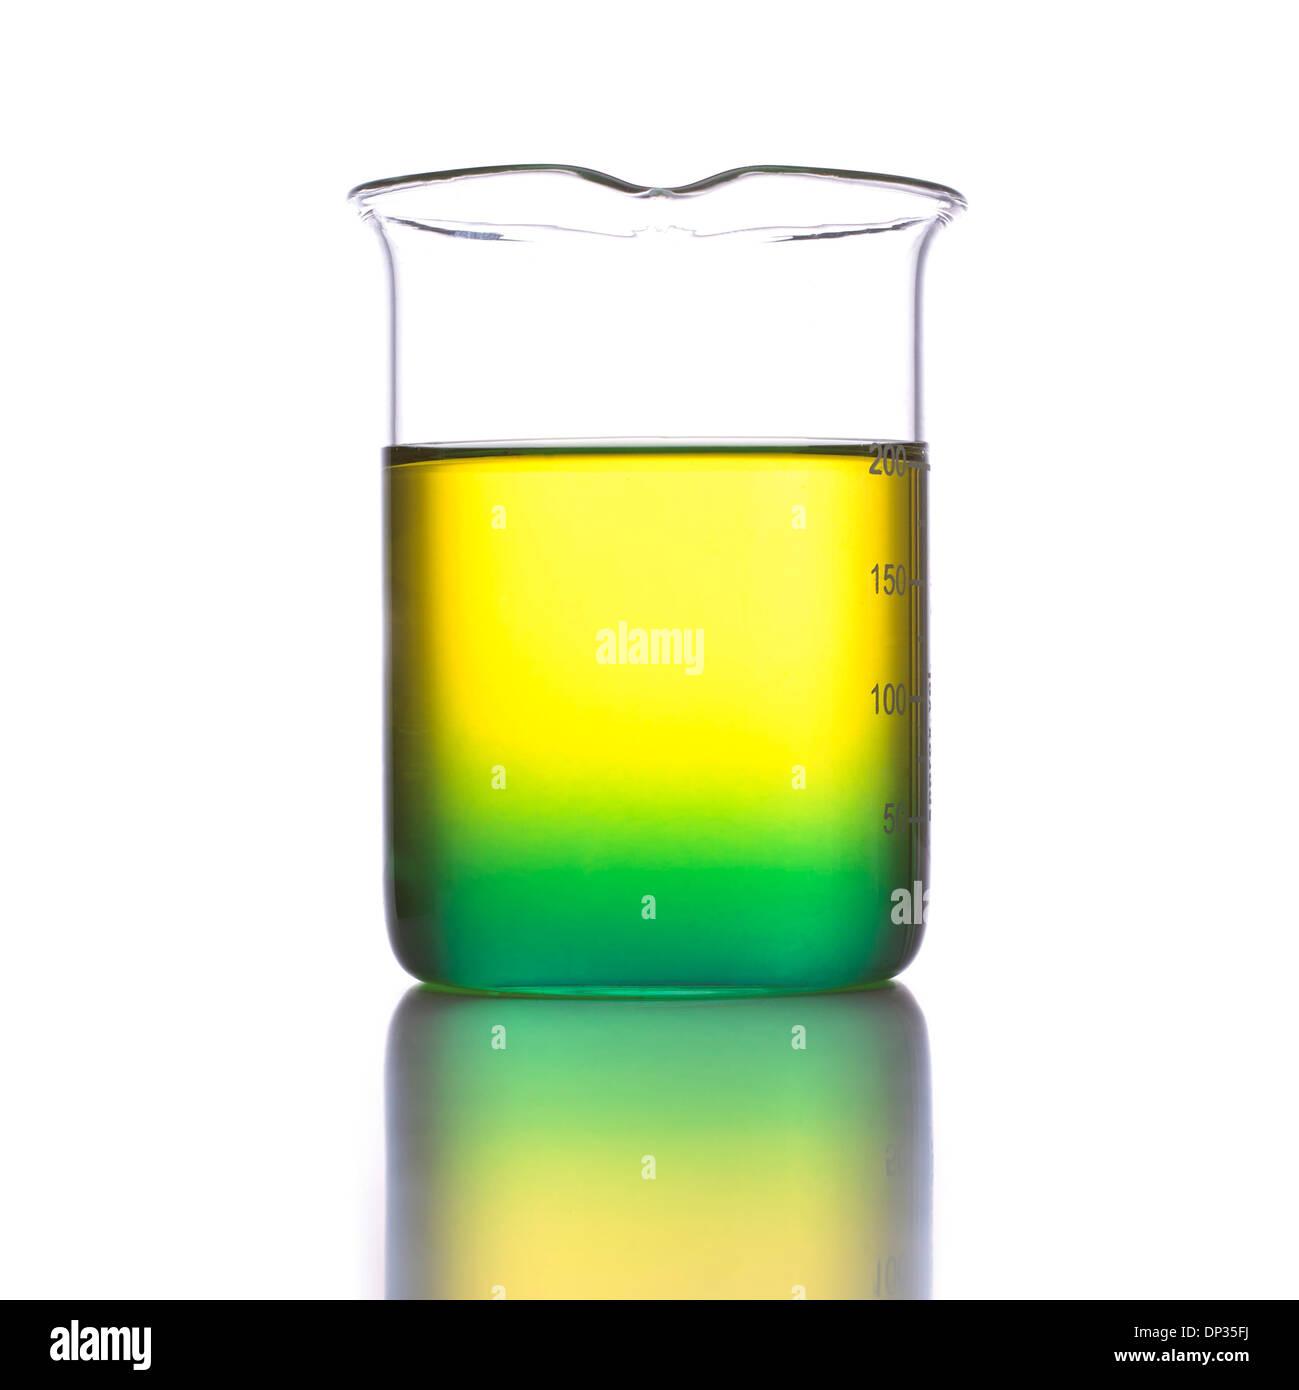 Laboratory beaker - Stock Image